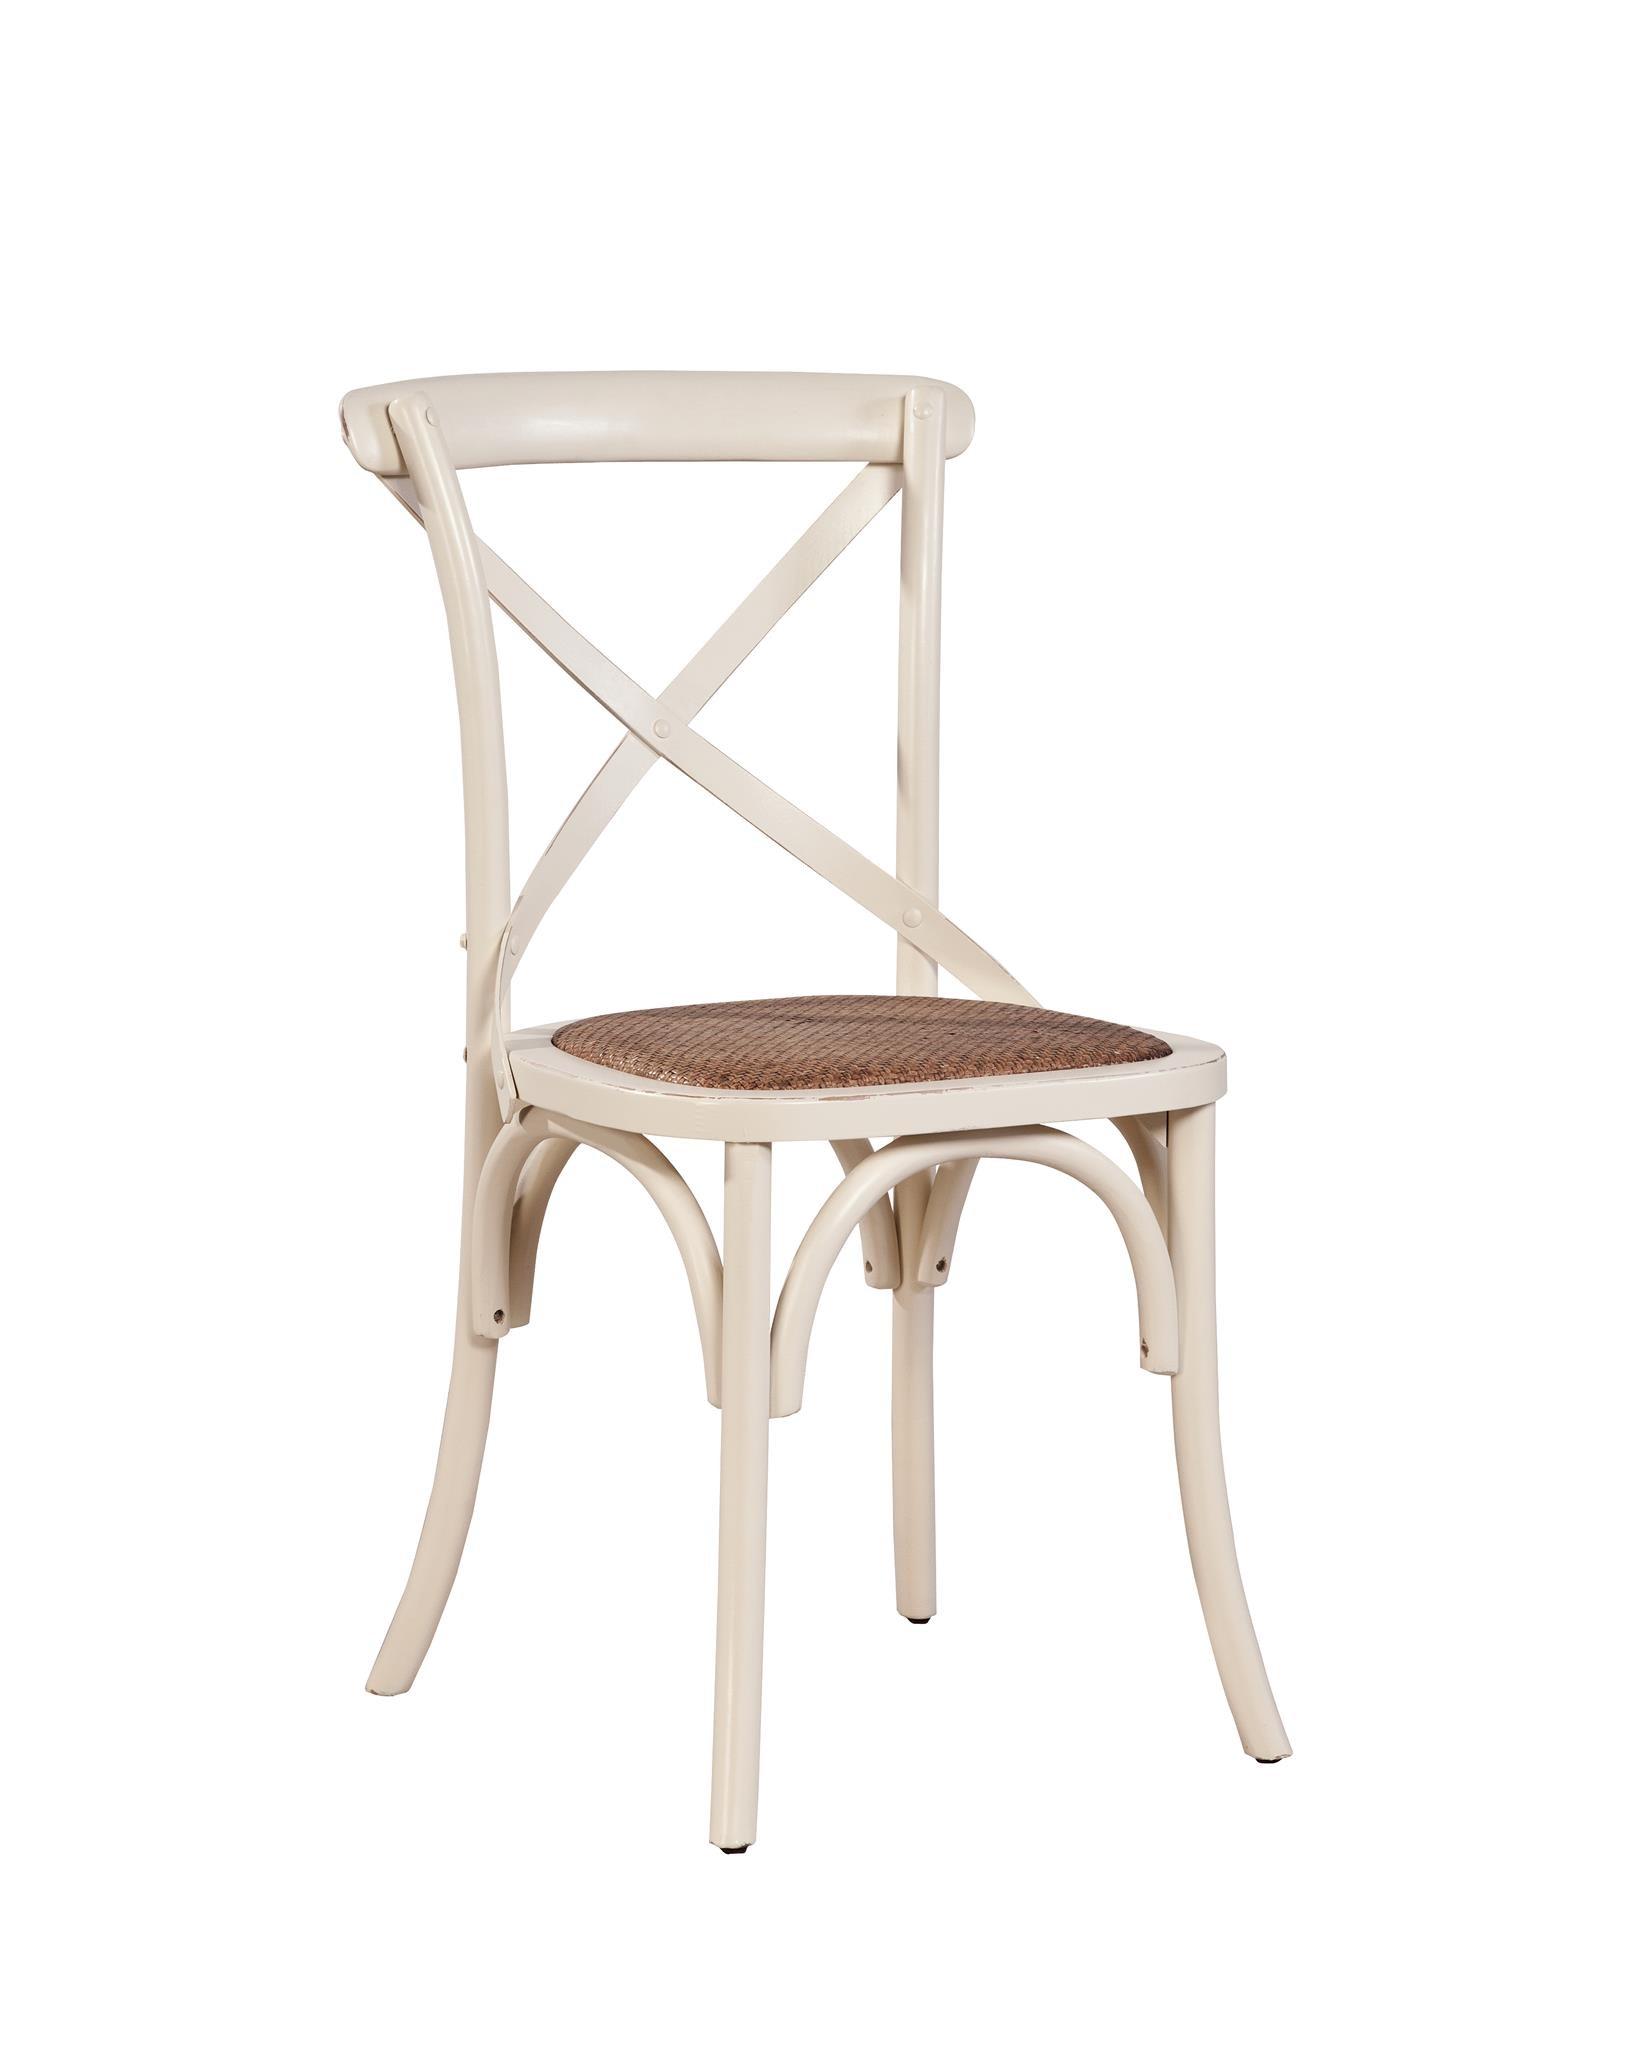 Merveilleux Furniture Classics, LTD Cafe Chair   Cream 507377